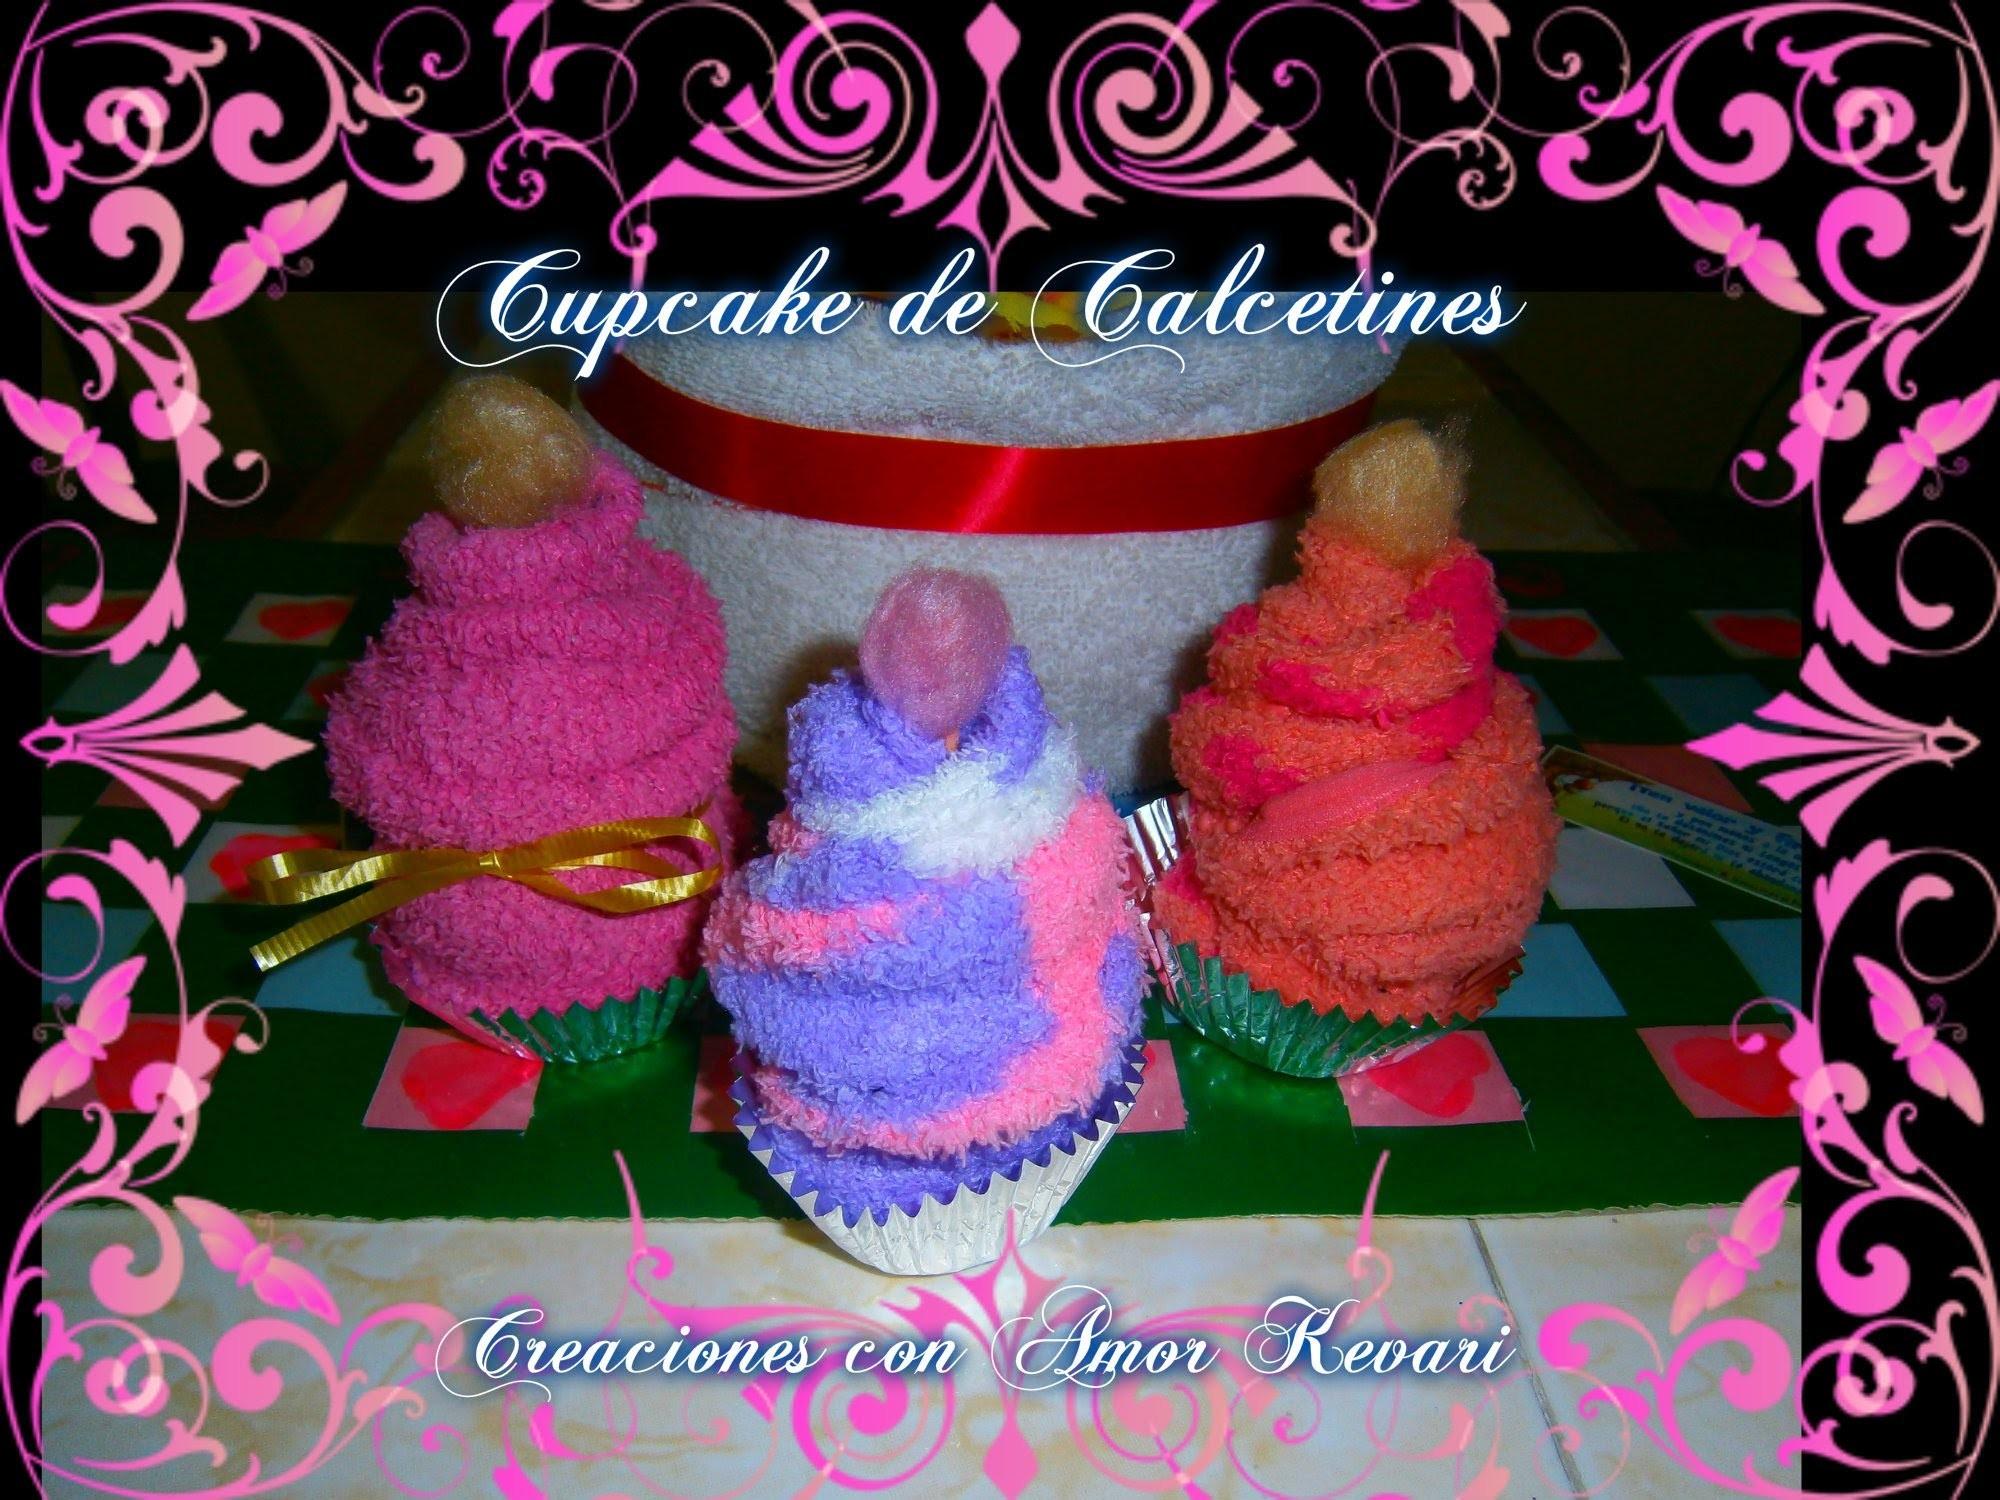 Como Hacer Cupcake de Calcetines。・:*:・゚☆.How to Make a Socks Cupcakes